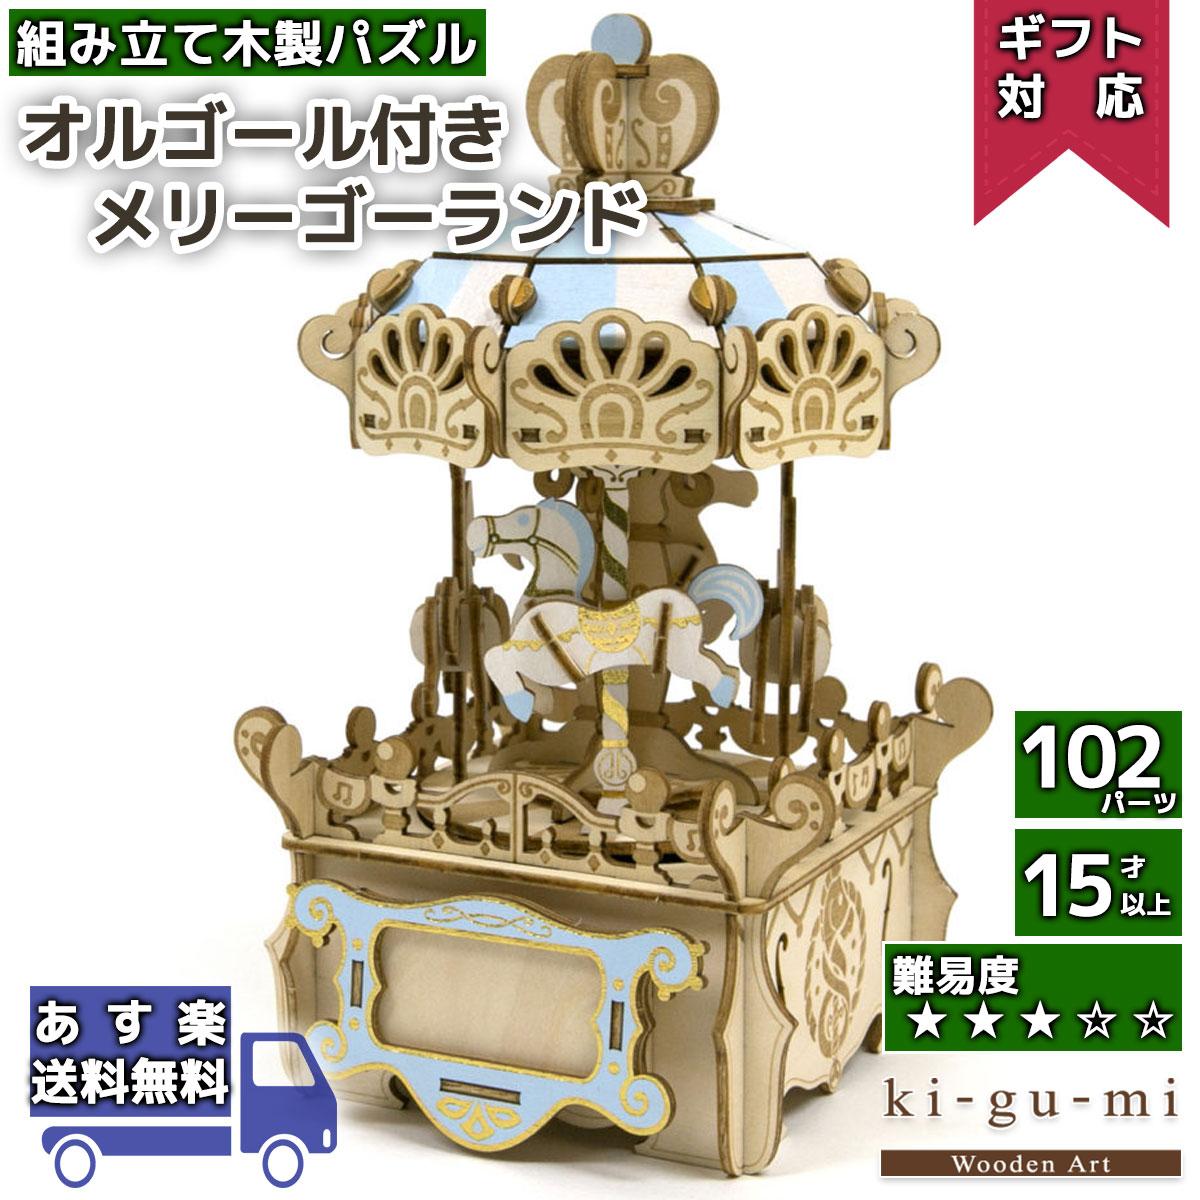 知育玩具・学習玩具, 知育パズル 10OFF 311 01:59 kigumi ki-gu-mi azone 3D